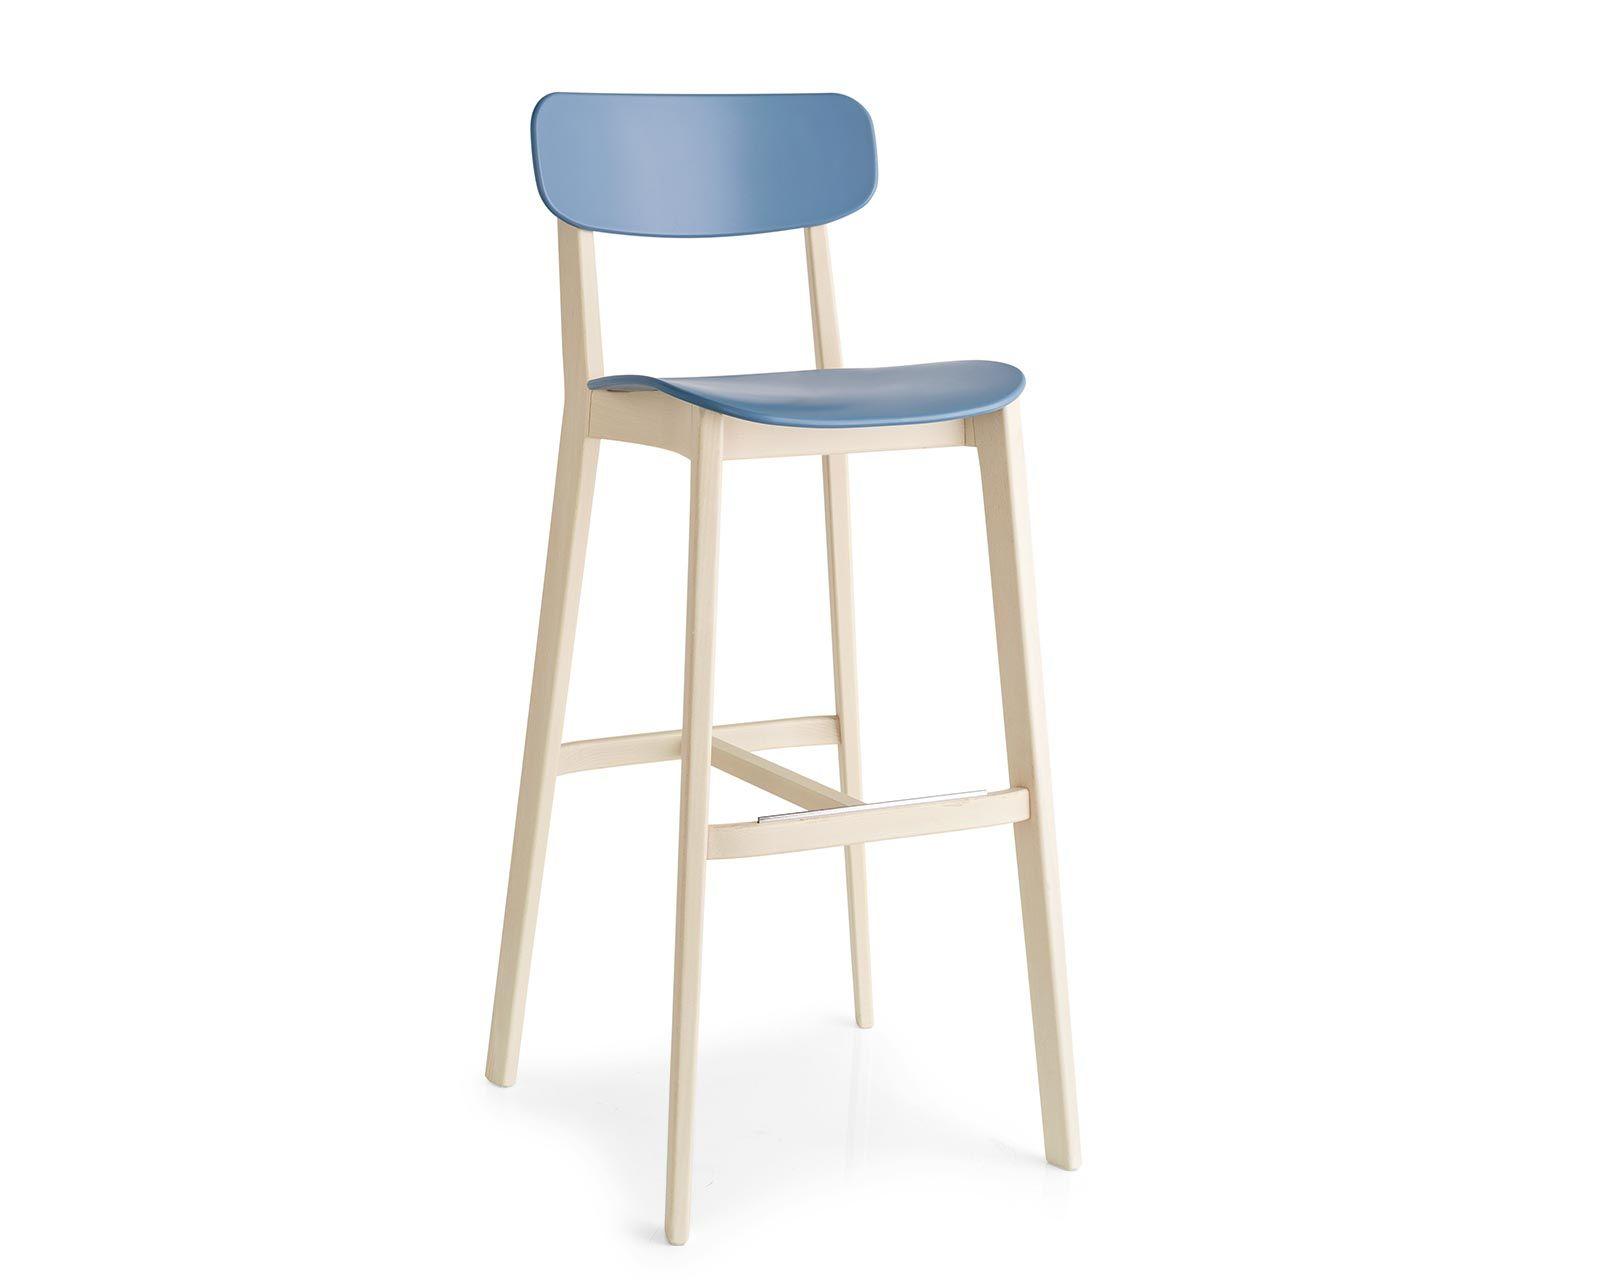 Segis Sedie ~ Pin by riccardo bertelli on sedie divani poltrone pinterest